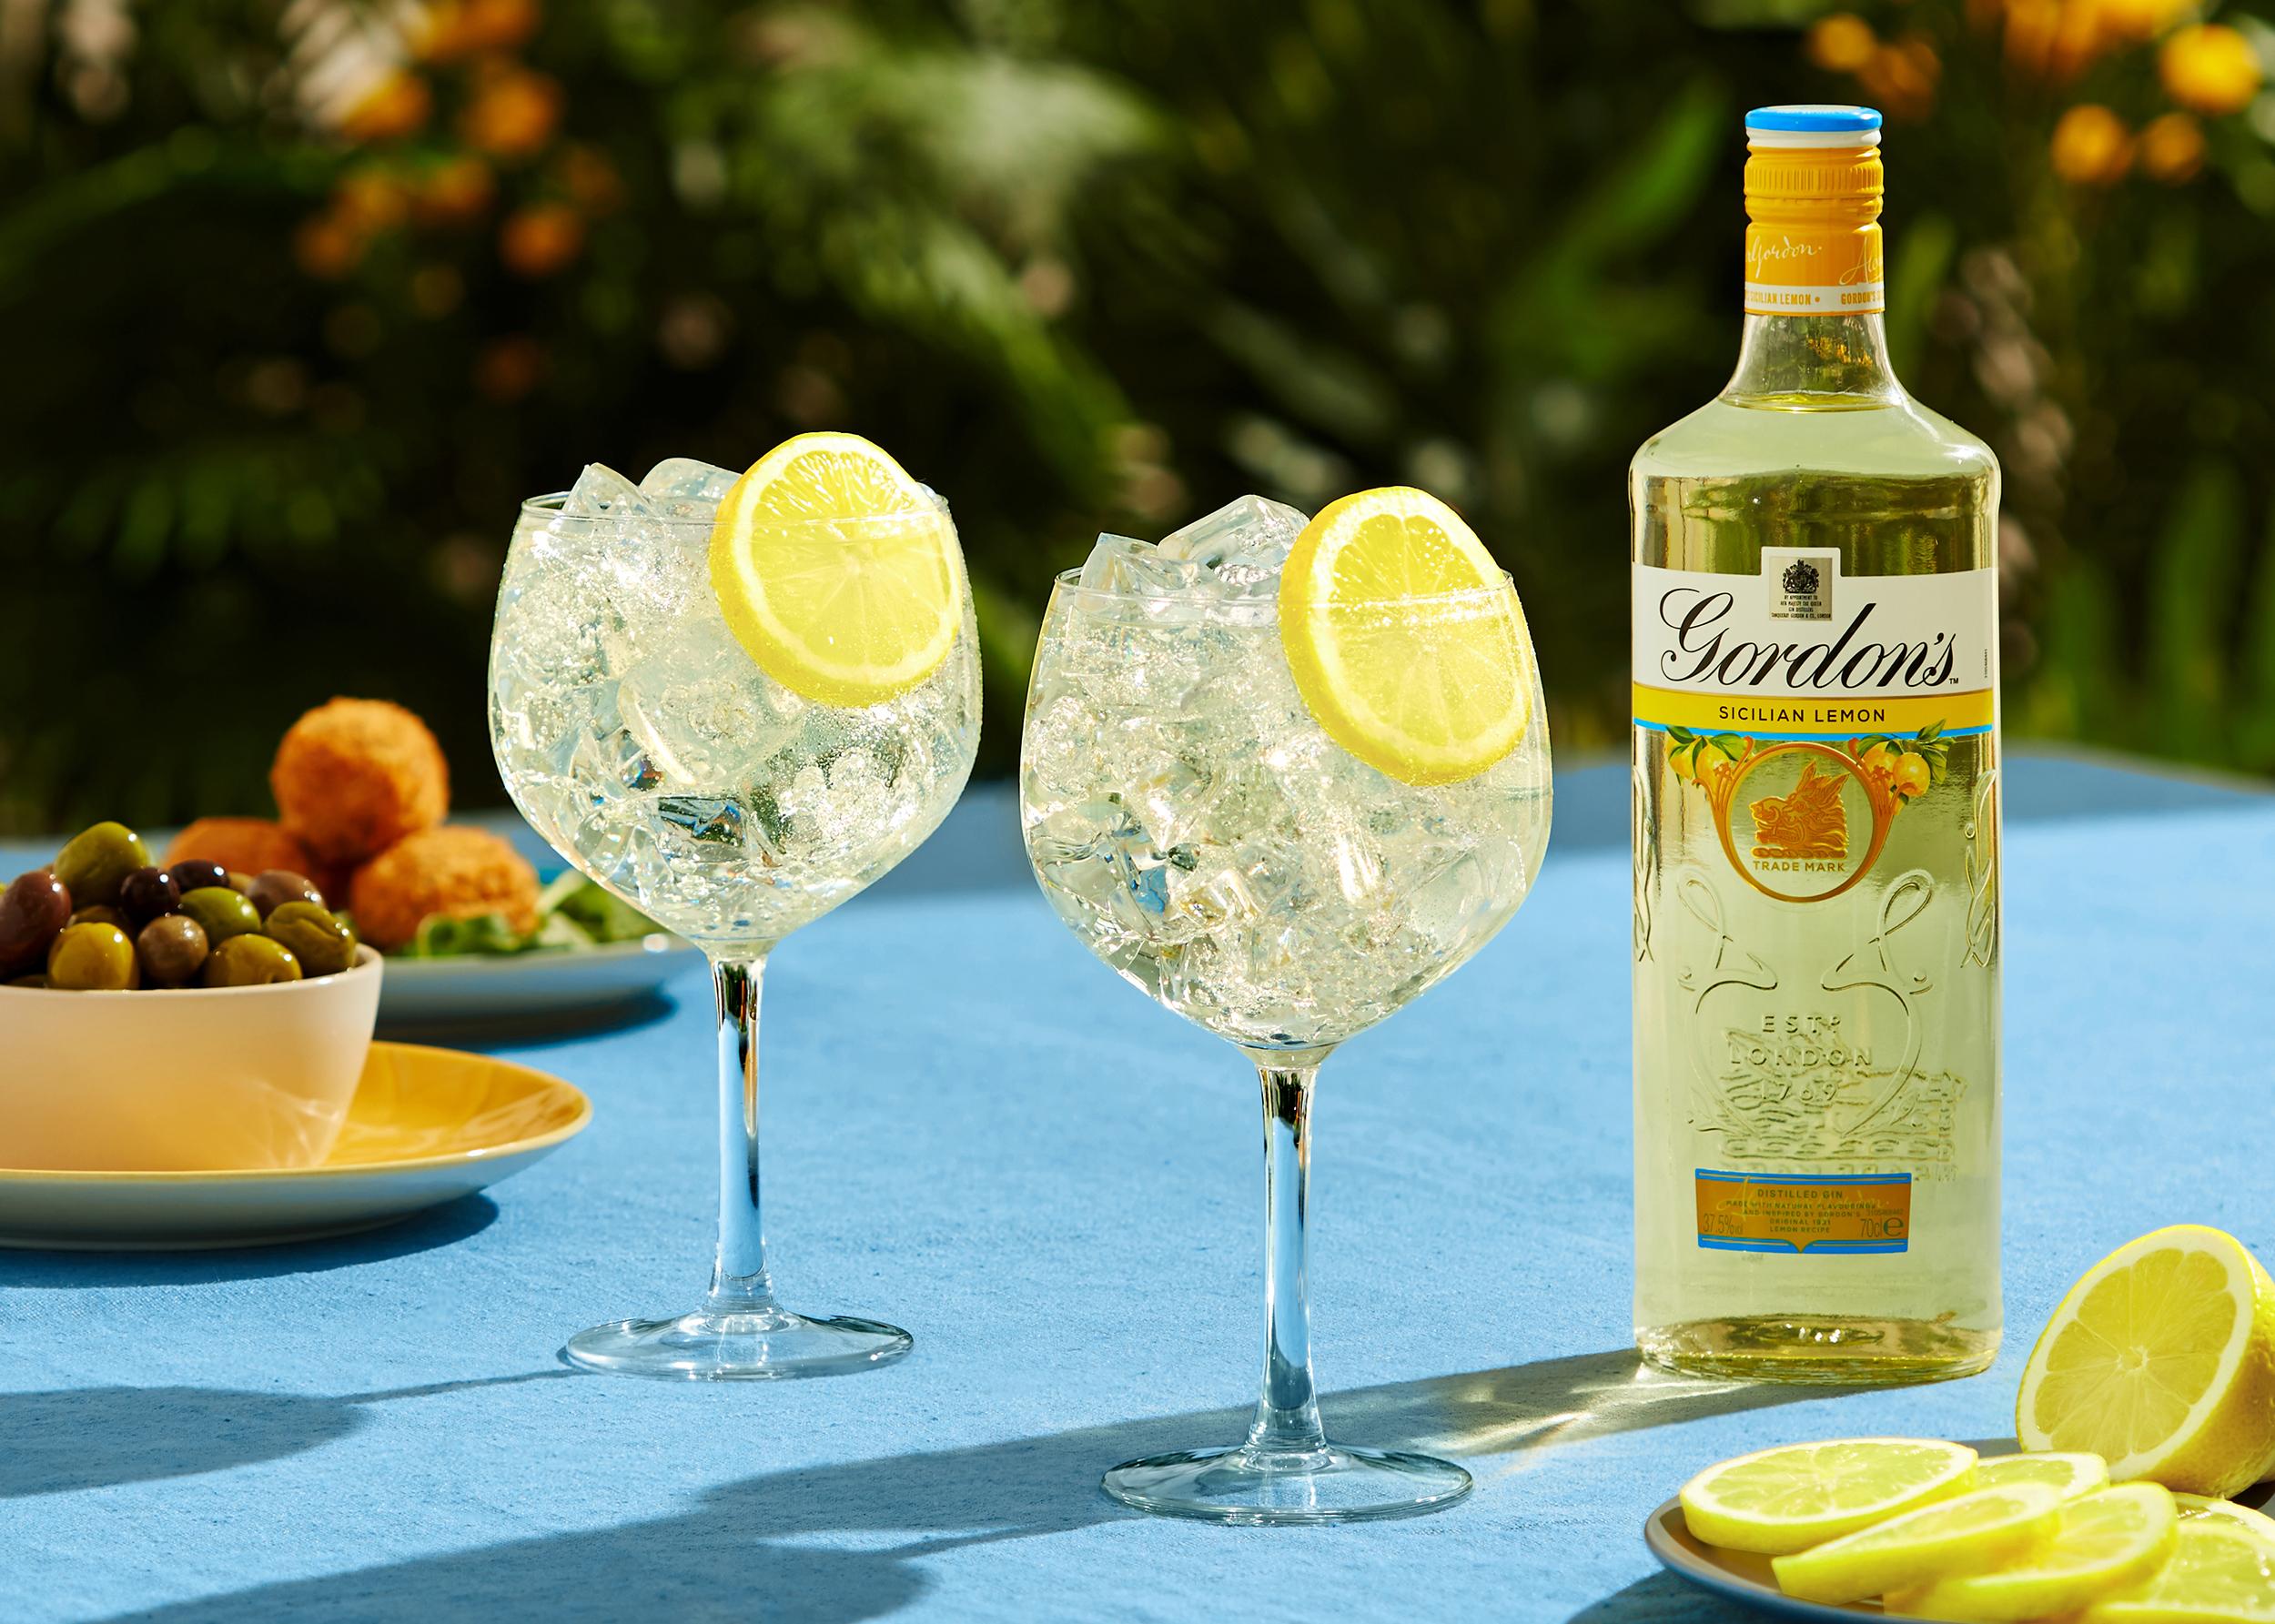 Gordon's Sicilian Lemon Gin cocktail